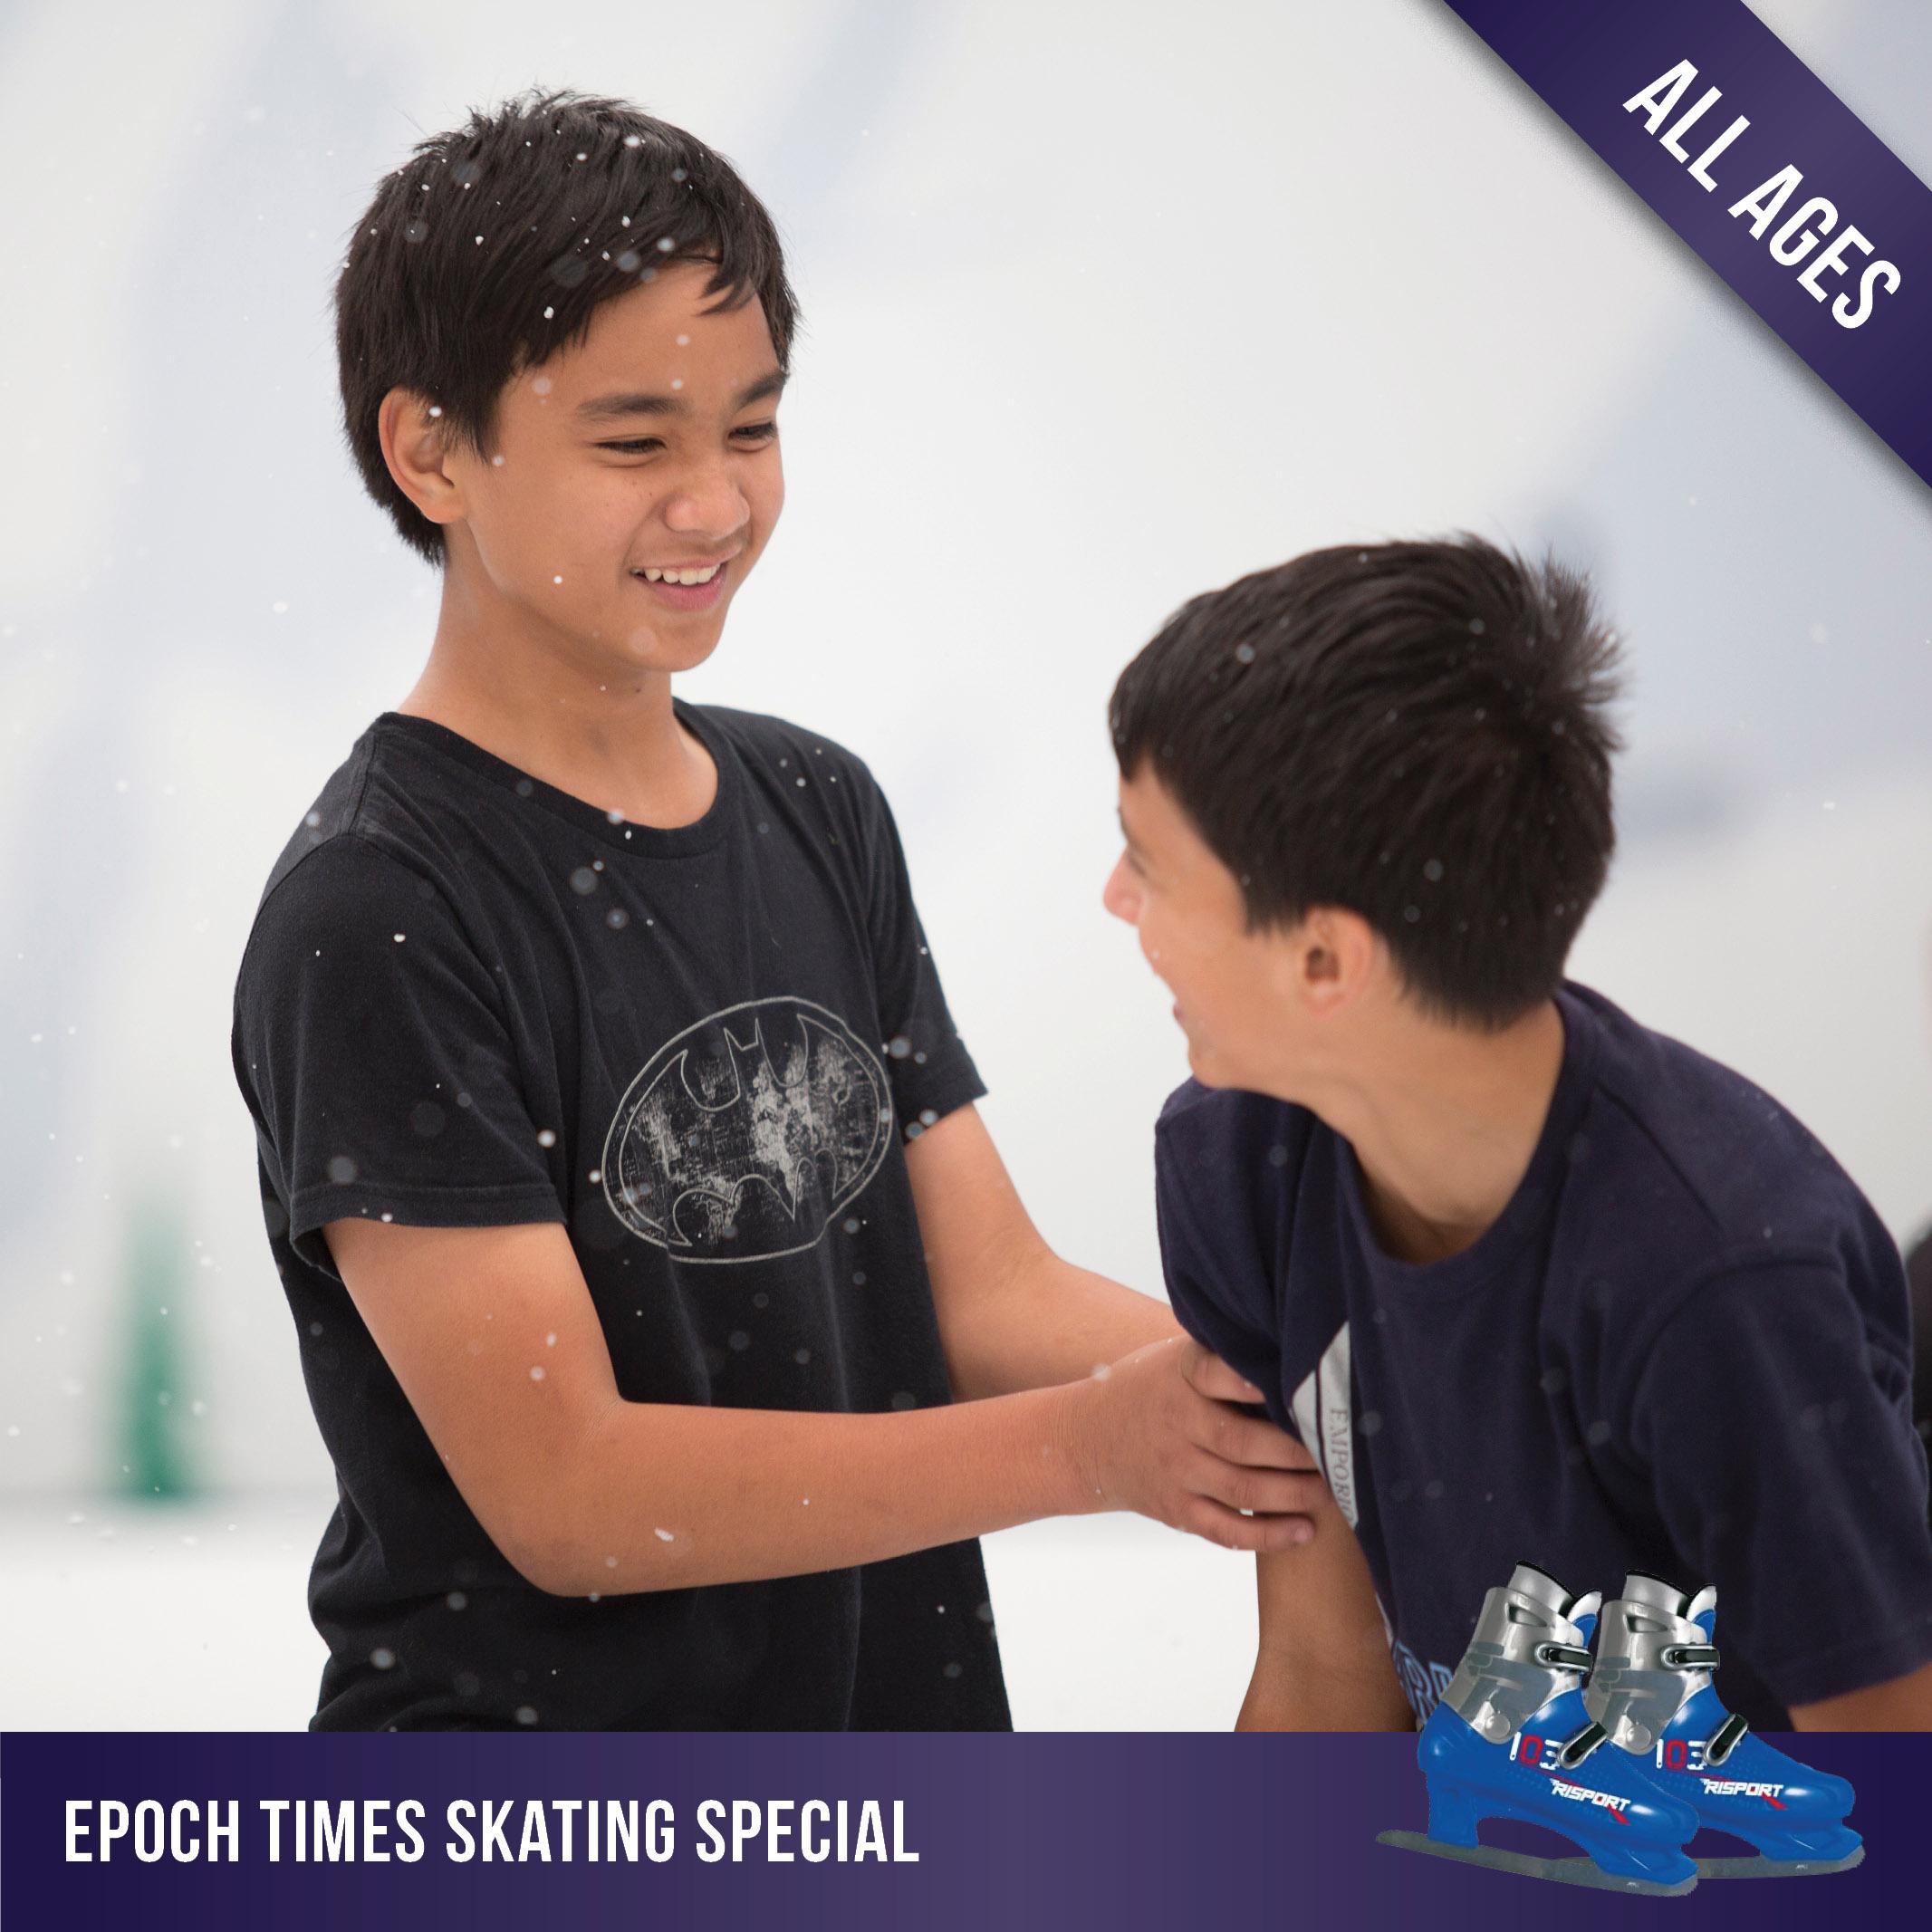 epoch times newspaper skating special